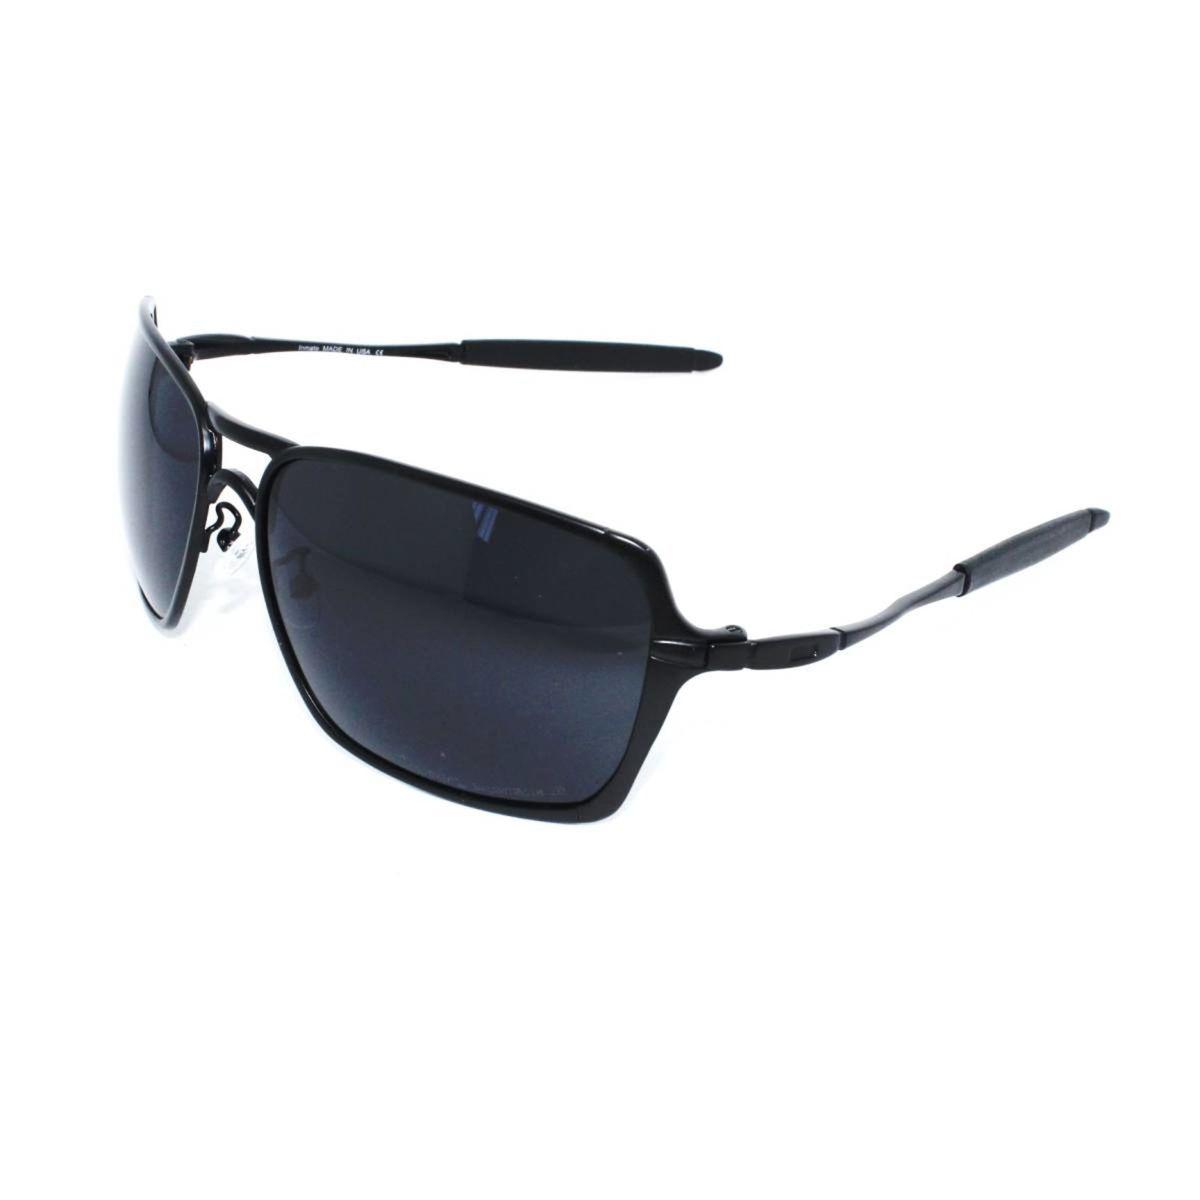 Óculos Oakley Inmate 100% Polarizado Promoção!!!   Óculos Masculino ... a0dbfad1ae